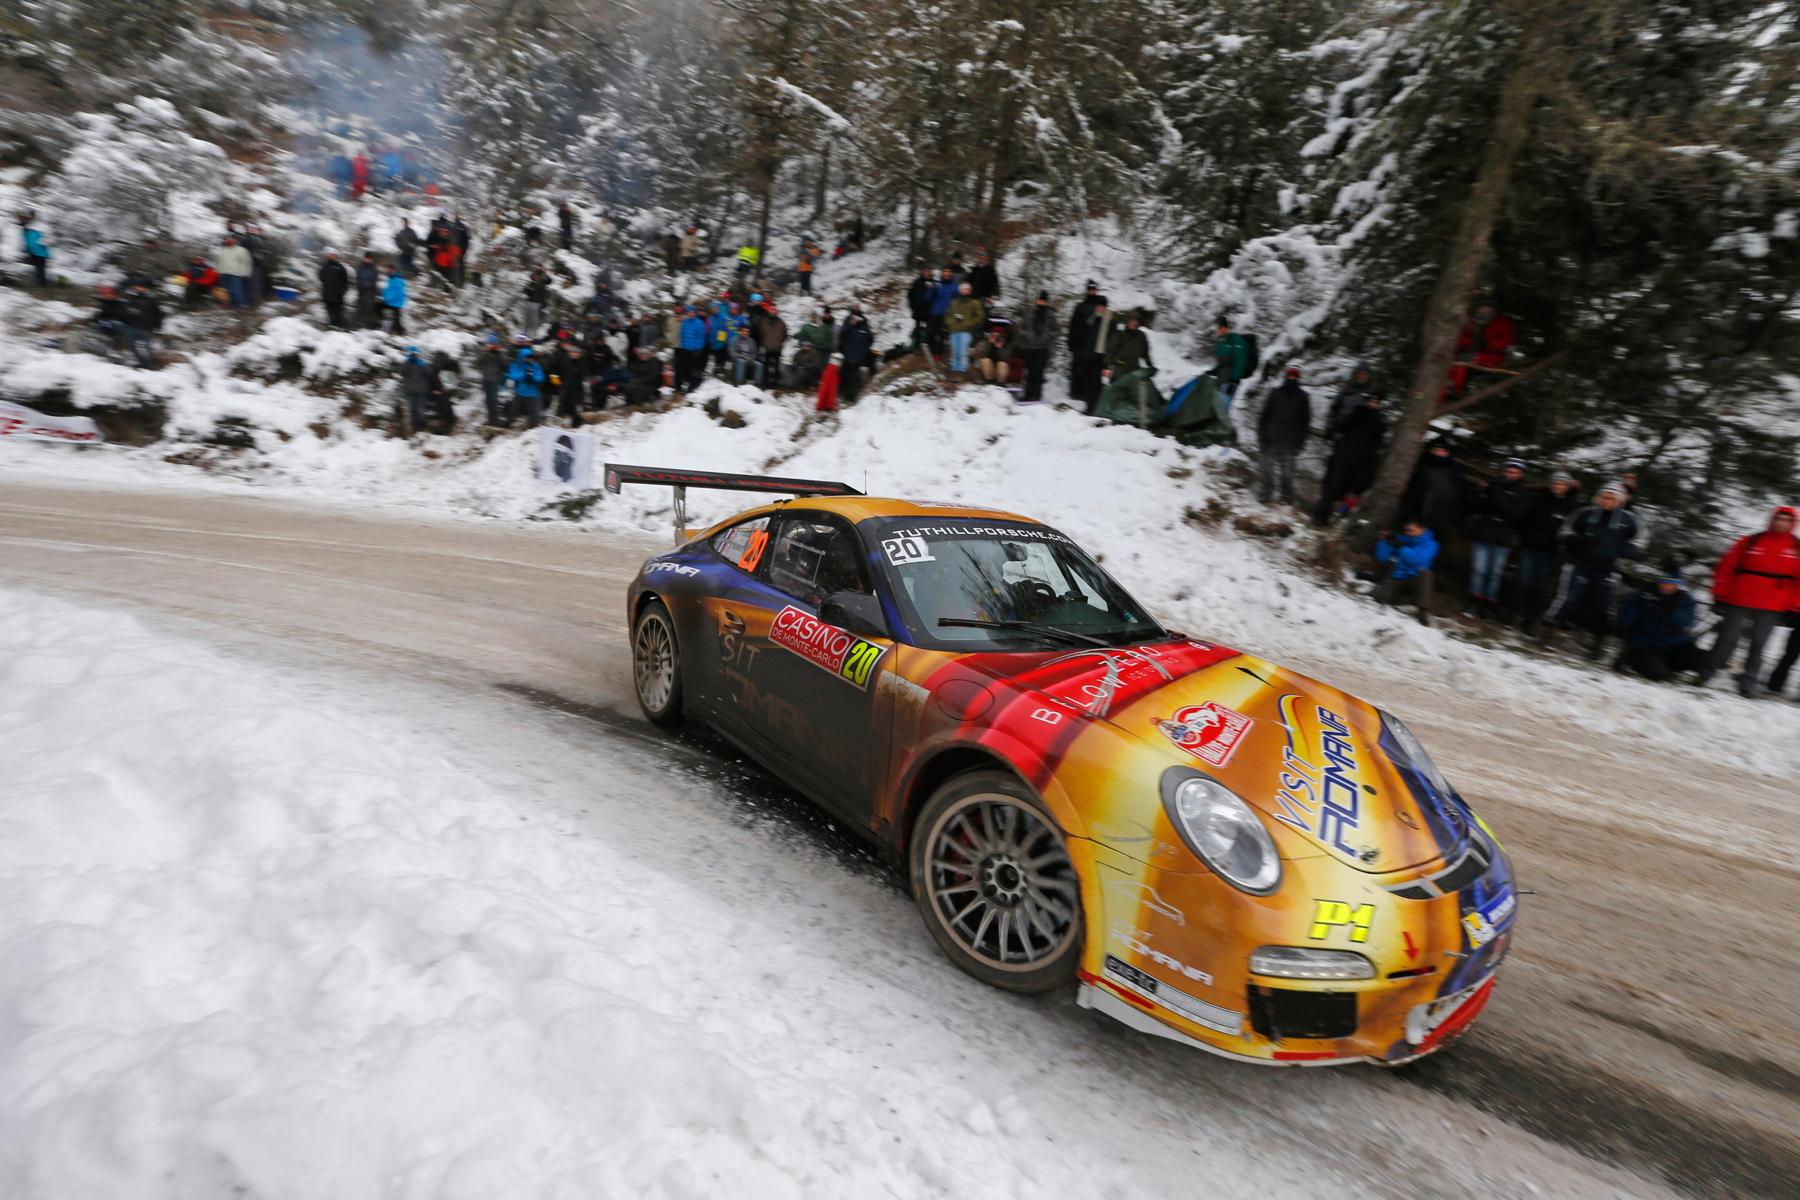 Porsche en hiver - Page 5 Francois-delecour-tuthill-porsche-monte-1